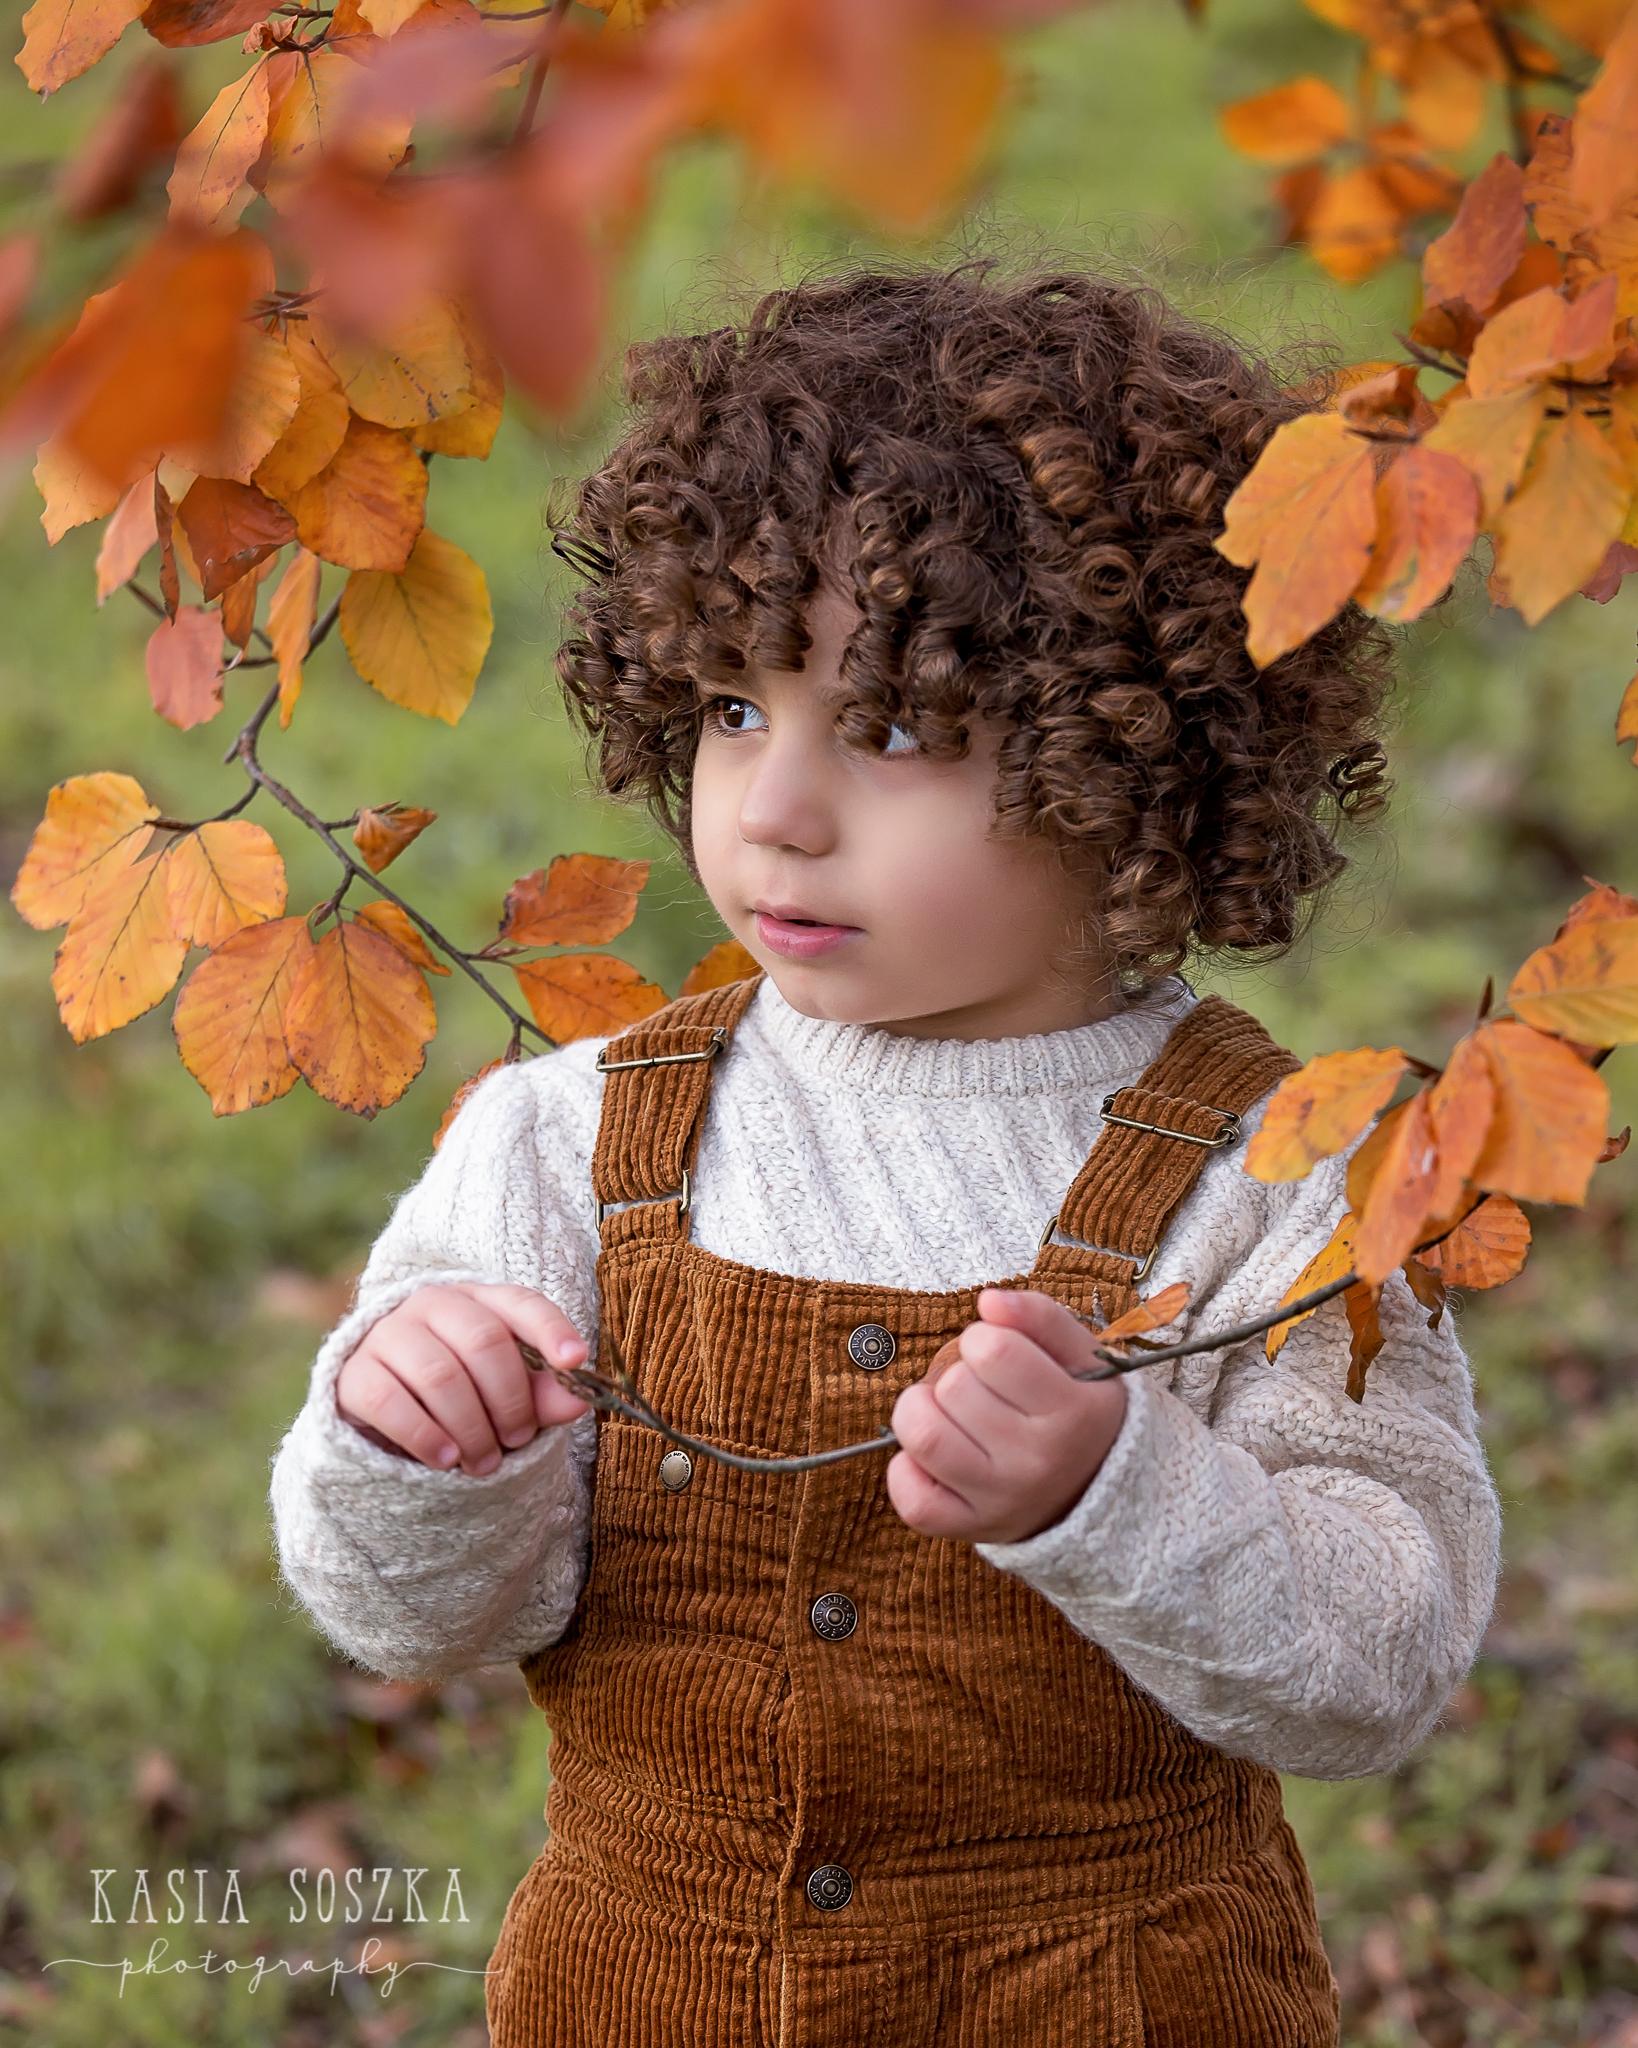 Yorkshire children photography: cute little boy with dark curly hair standing under autumn tree.